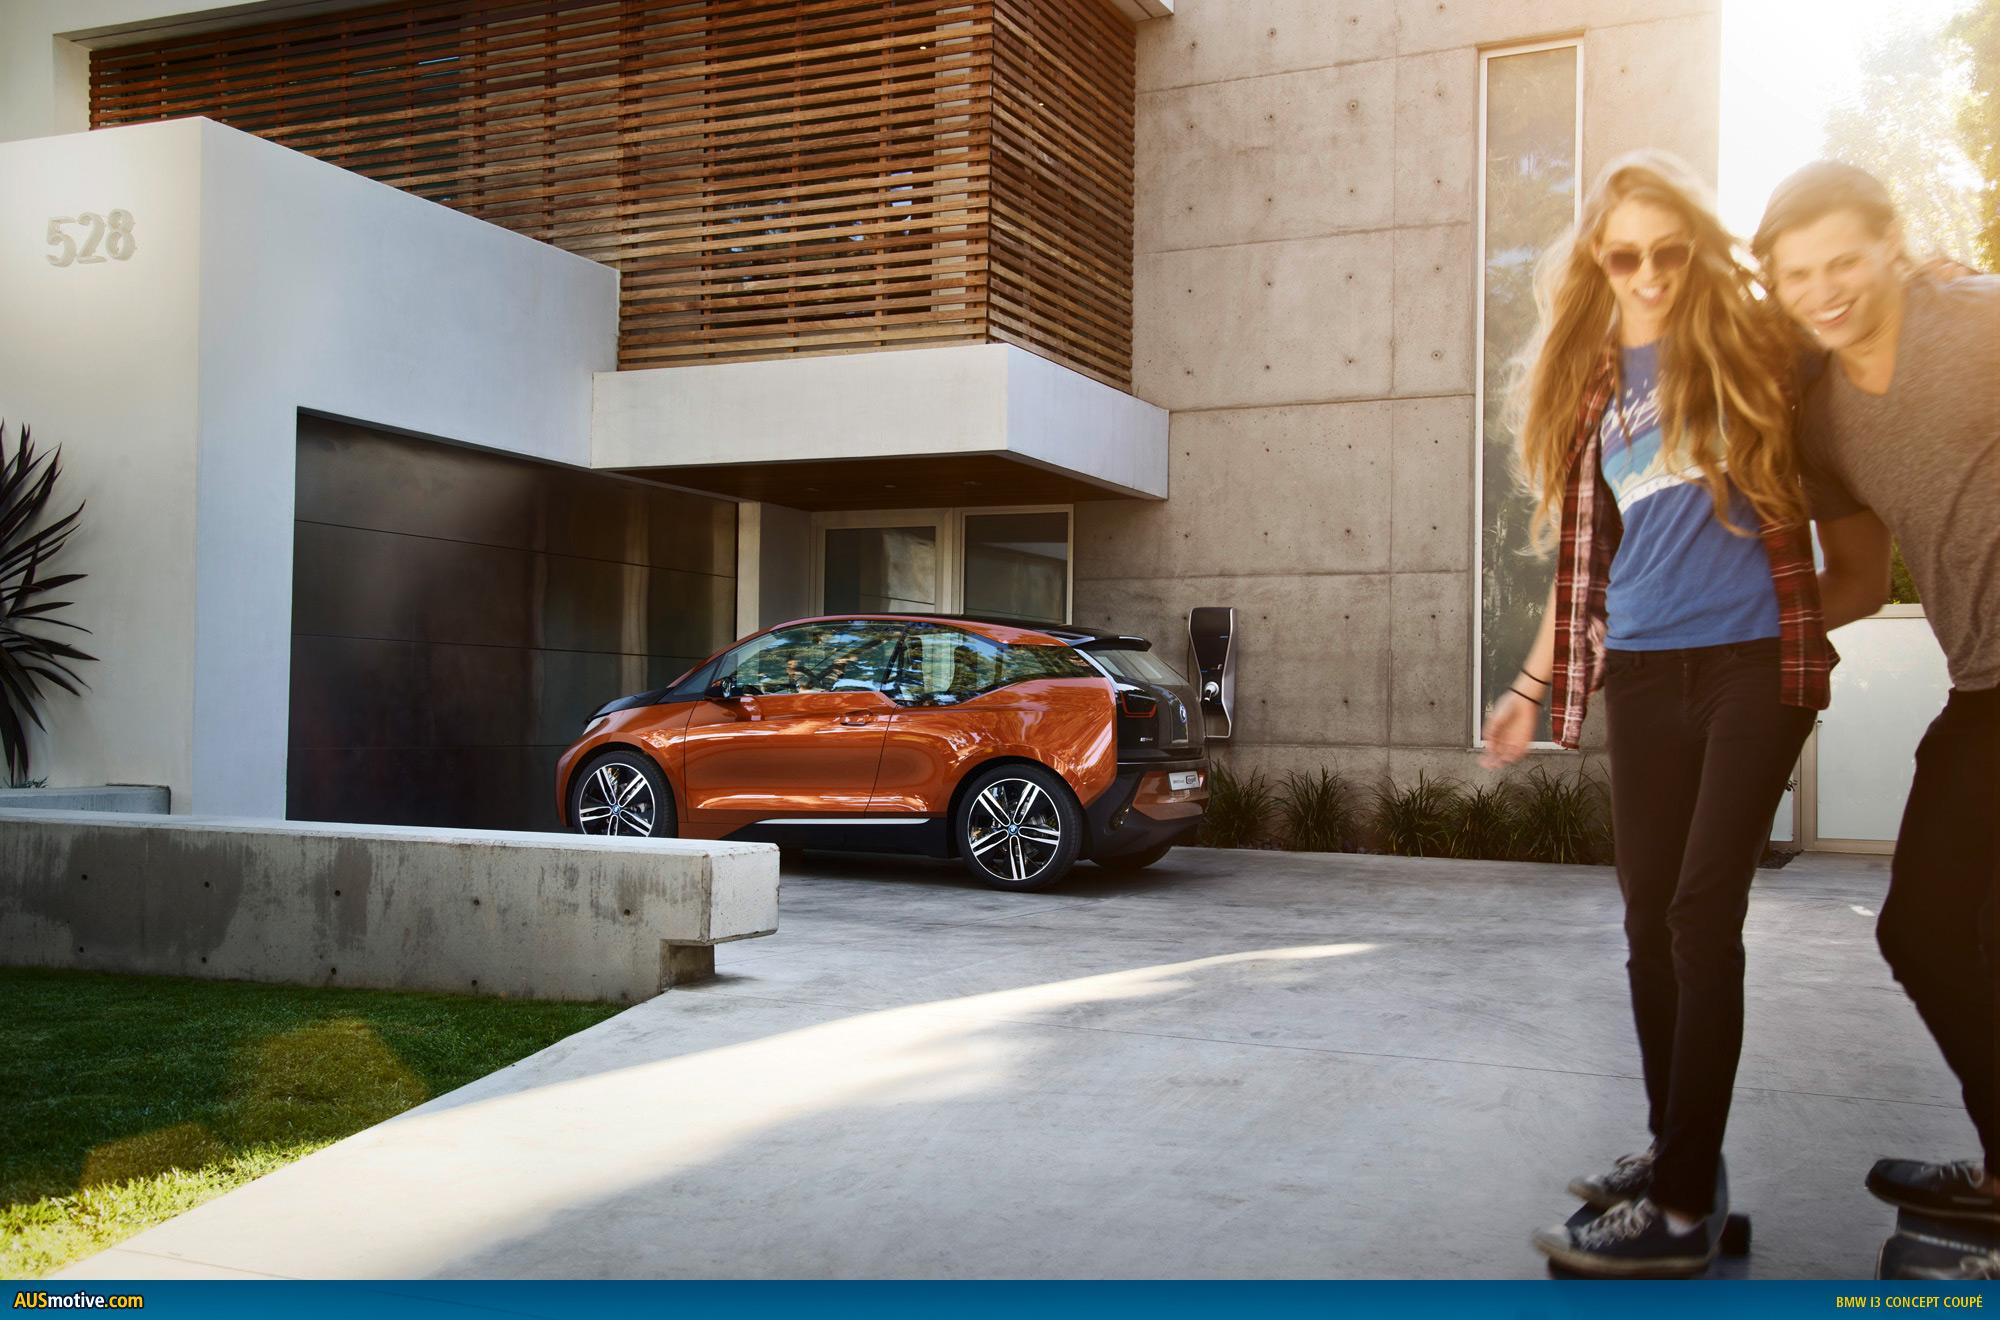 AUSmotive.com » LA 2012: BMW i3 Concept Coupé